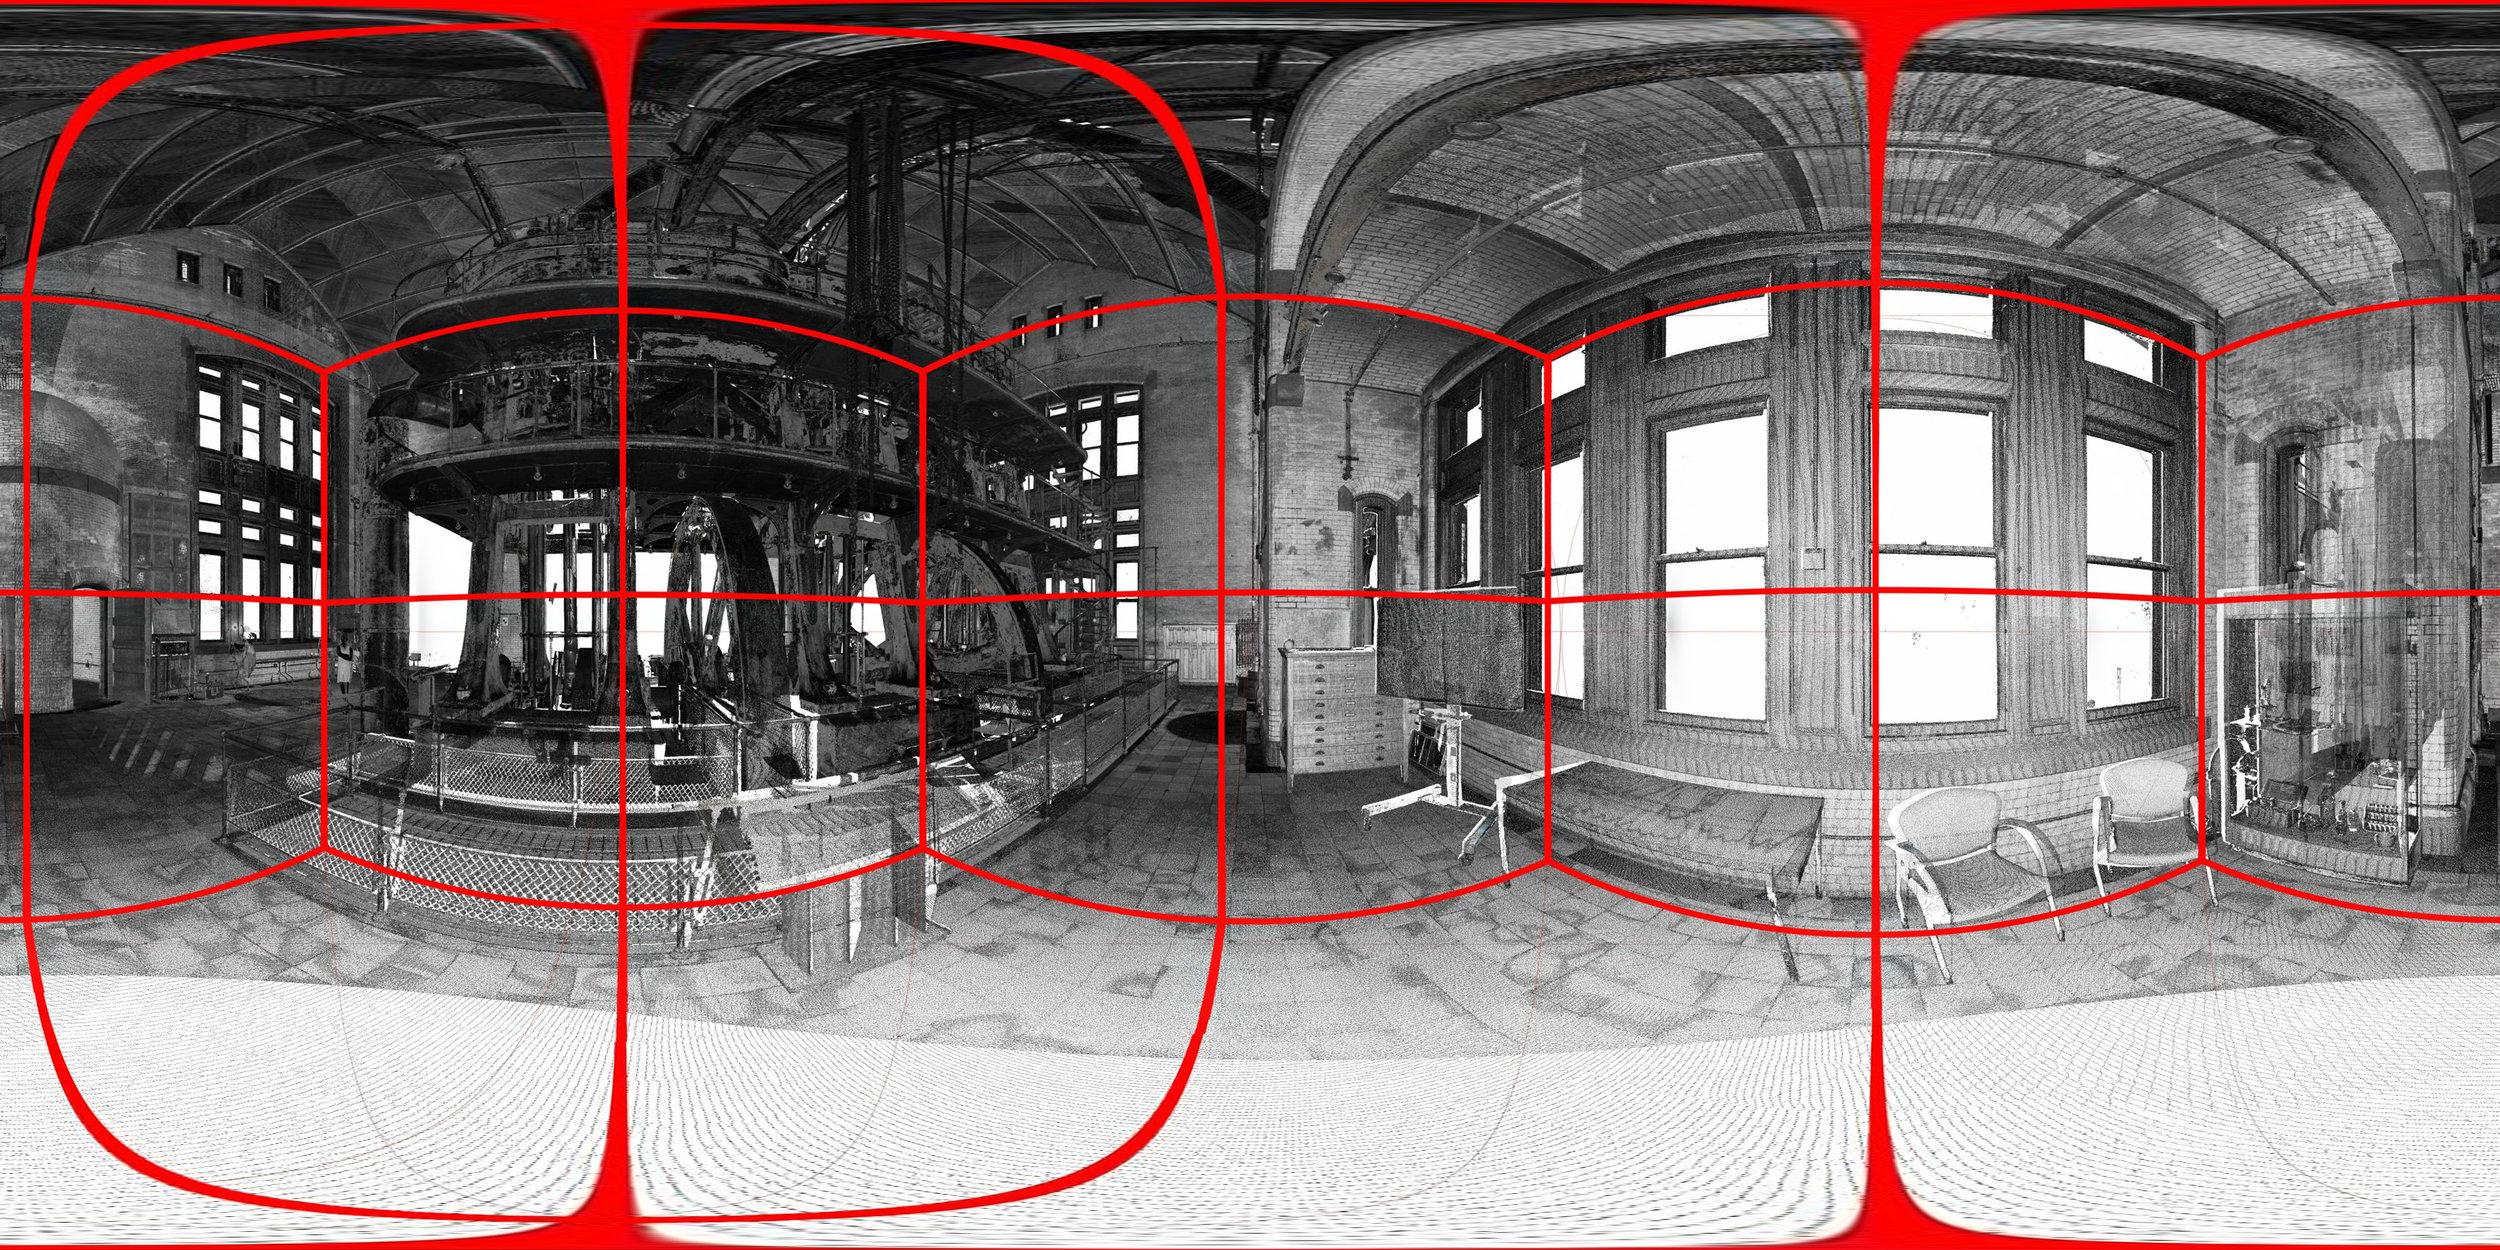 01B_VIEW TILE_01 Panorama.jpg